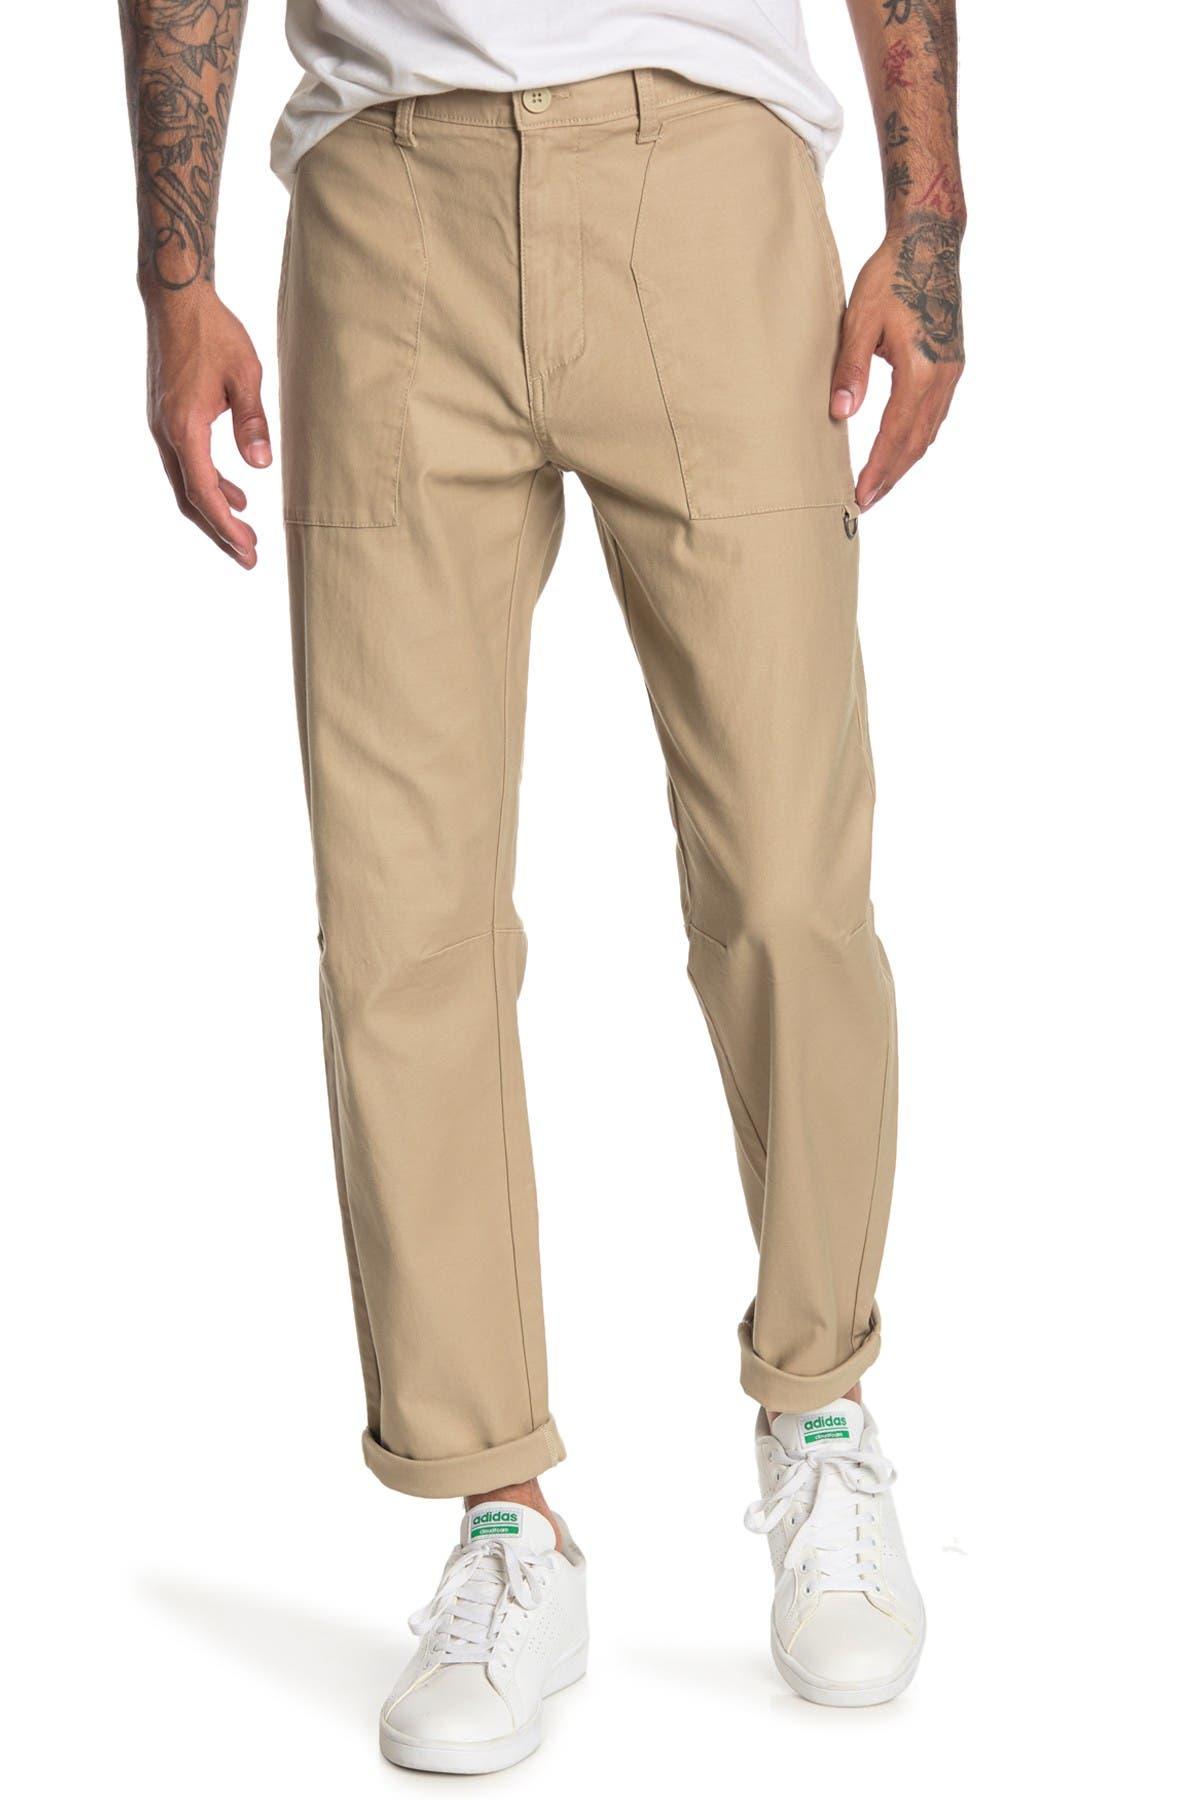 Image of Oakley Workwear Chino Pants